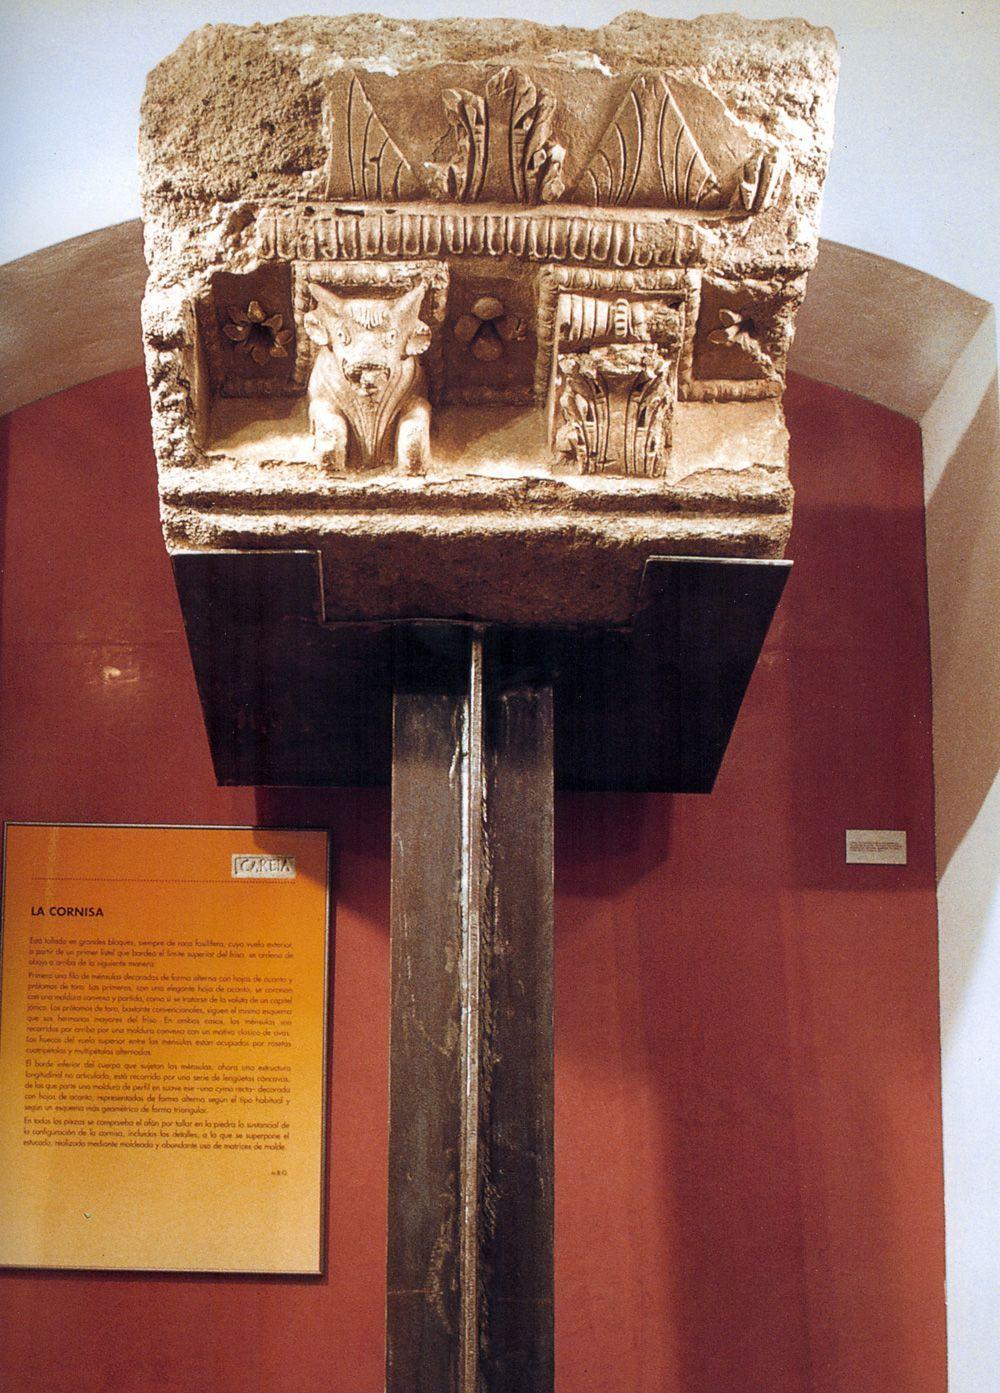 http://www.juntadeandalucia.es/cultura/rutasteatro/galeria_a/galeria_048.jpg